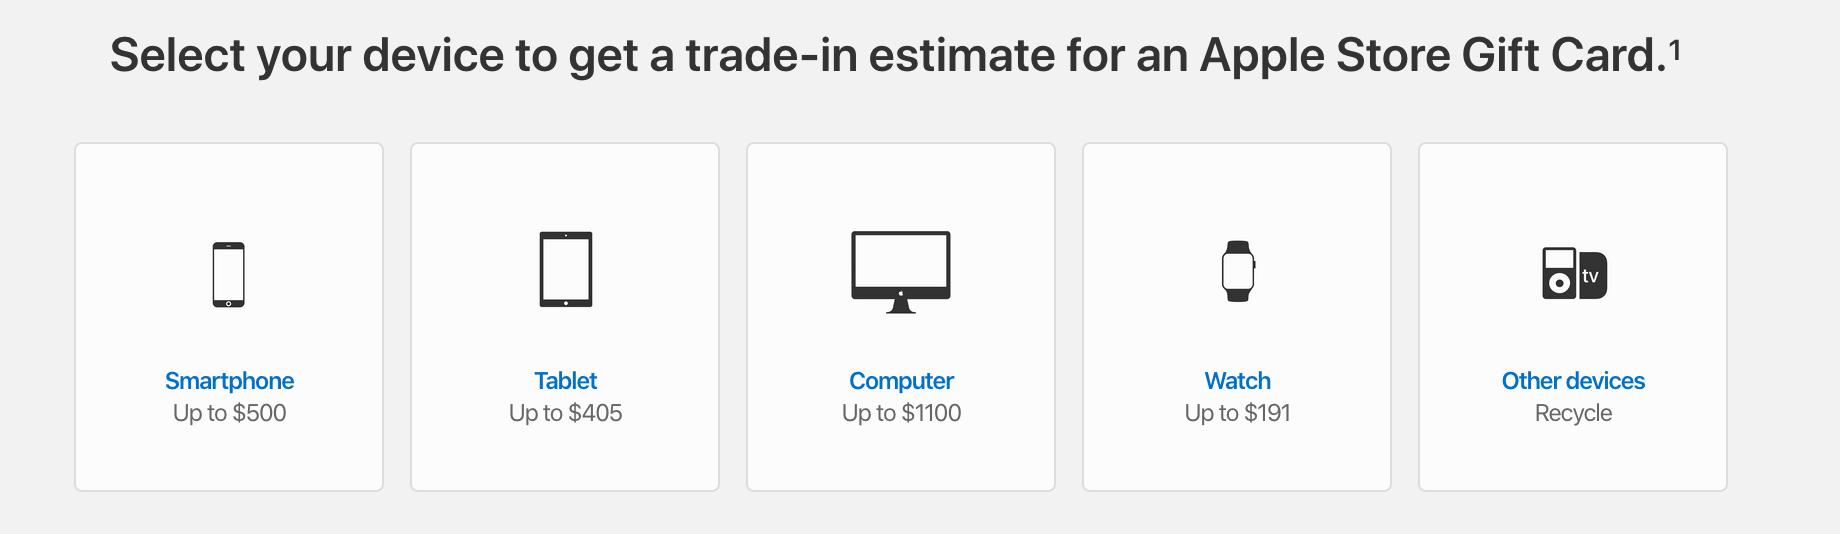 Apple GiveBack Select Device